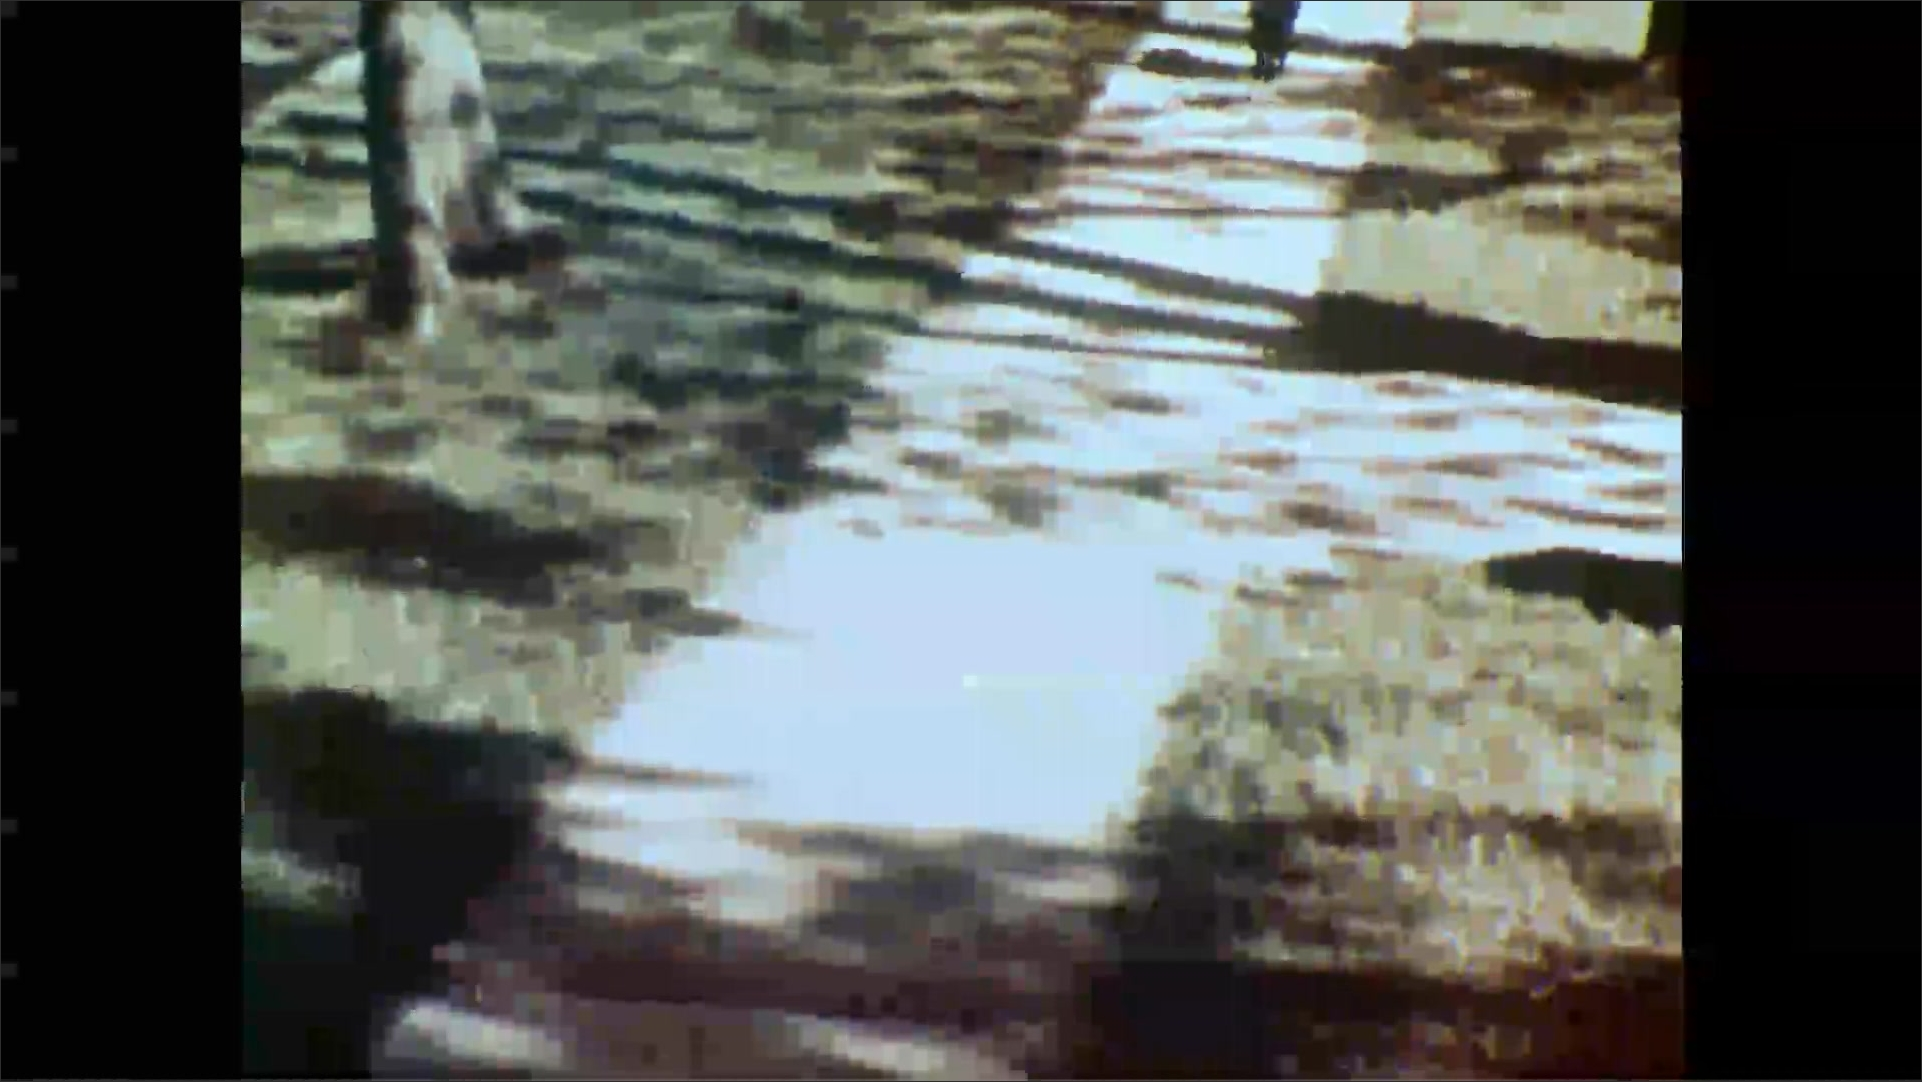 1950s: Lamb runs down neighborhood sidewalk. Girl shuts back door and skips through lawn. Girl covers mouth.